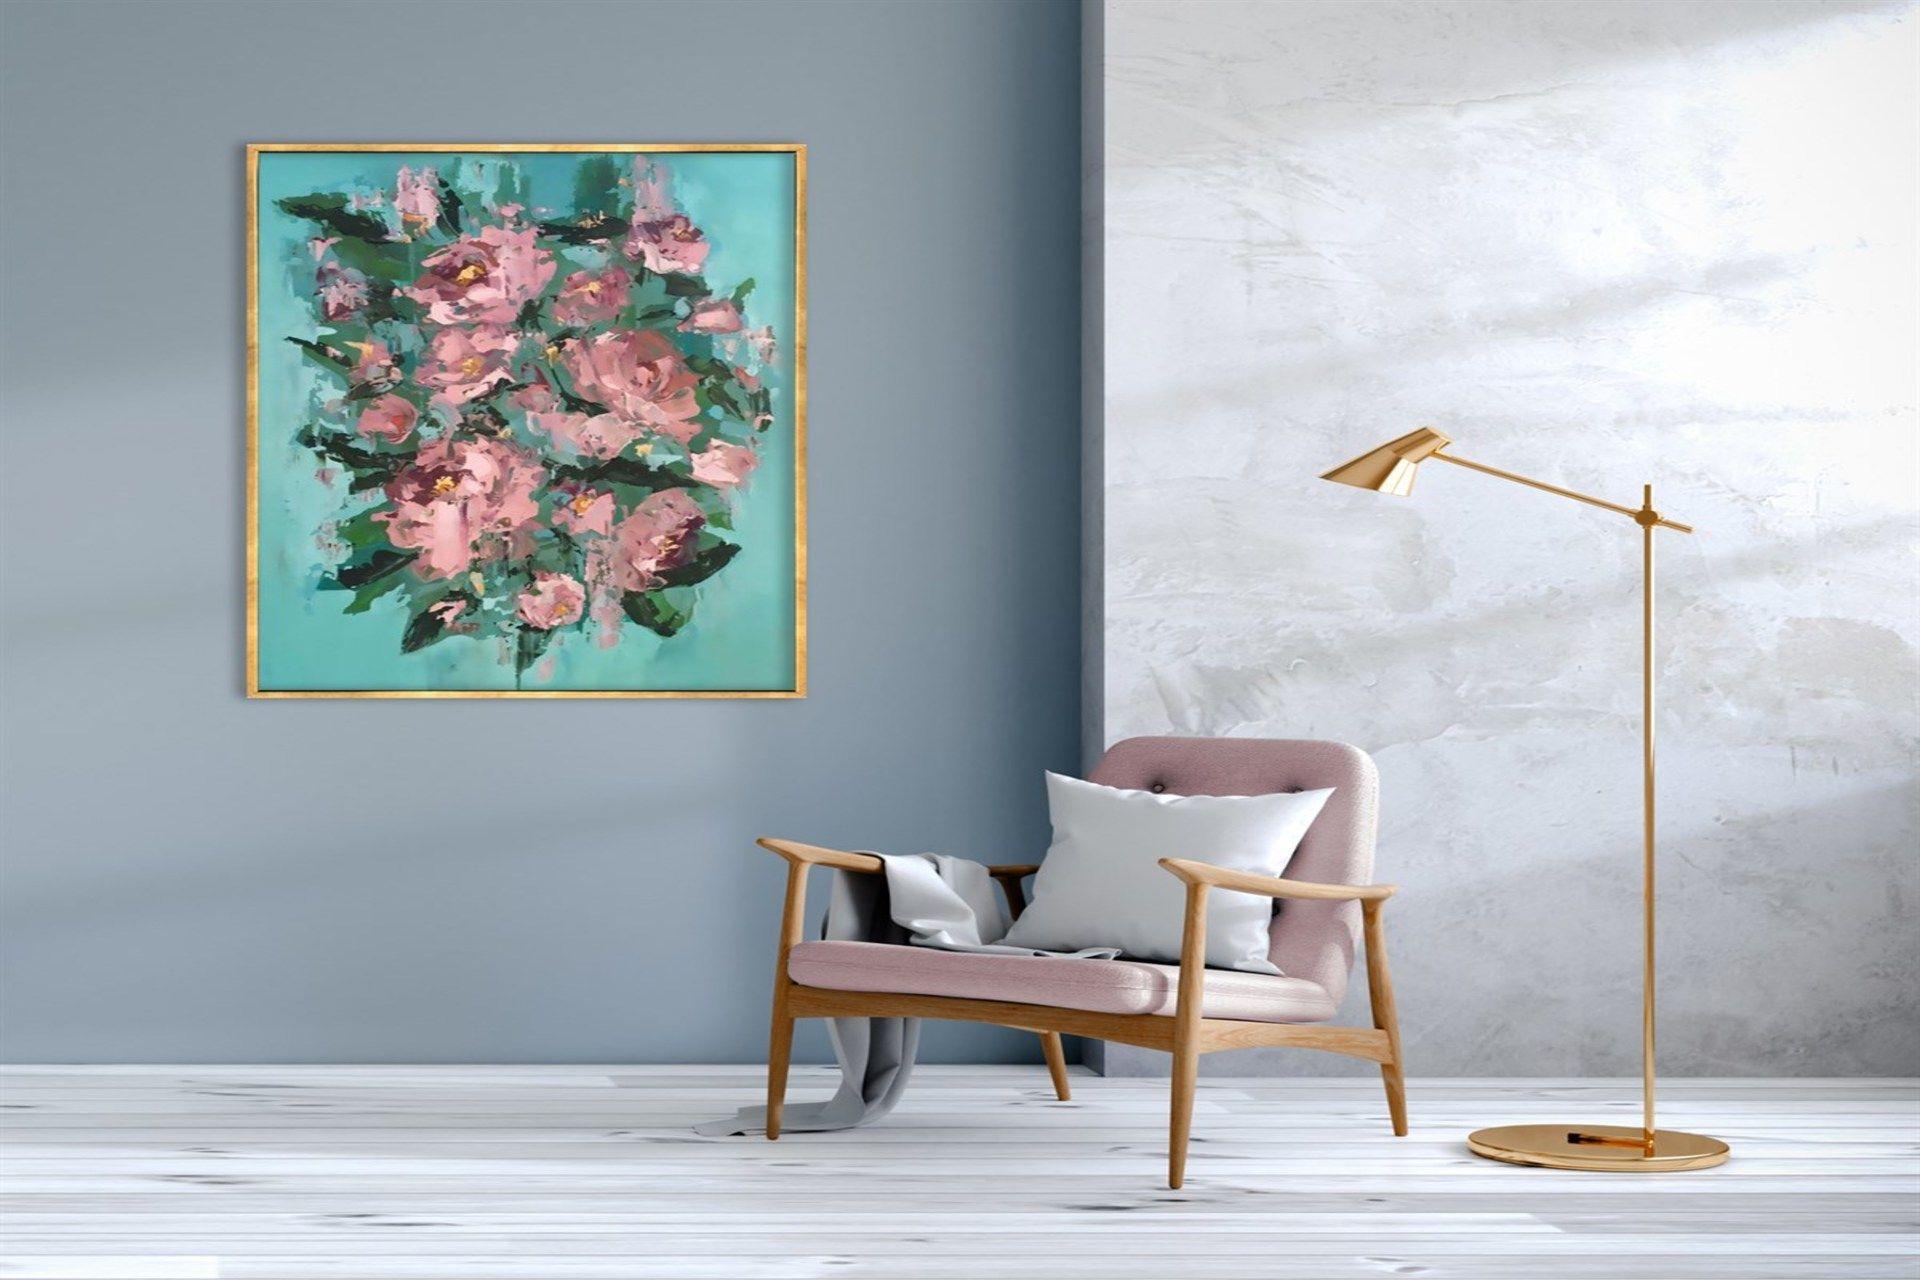 TABLOLİFE ABSTRACT PINK FLOWERS YAĞLI BOYA DOKULU TABLO  90X120 CM